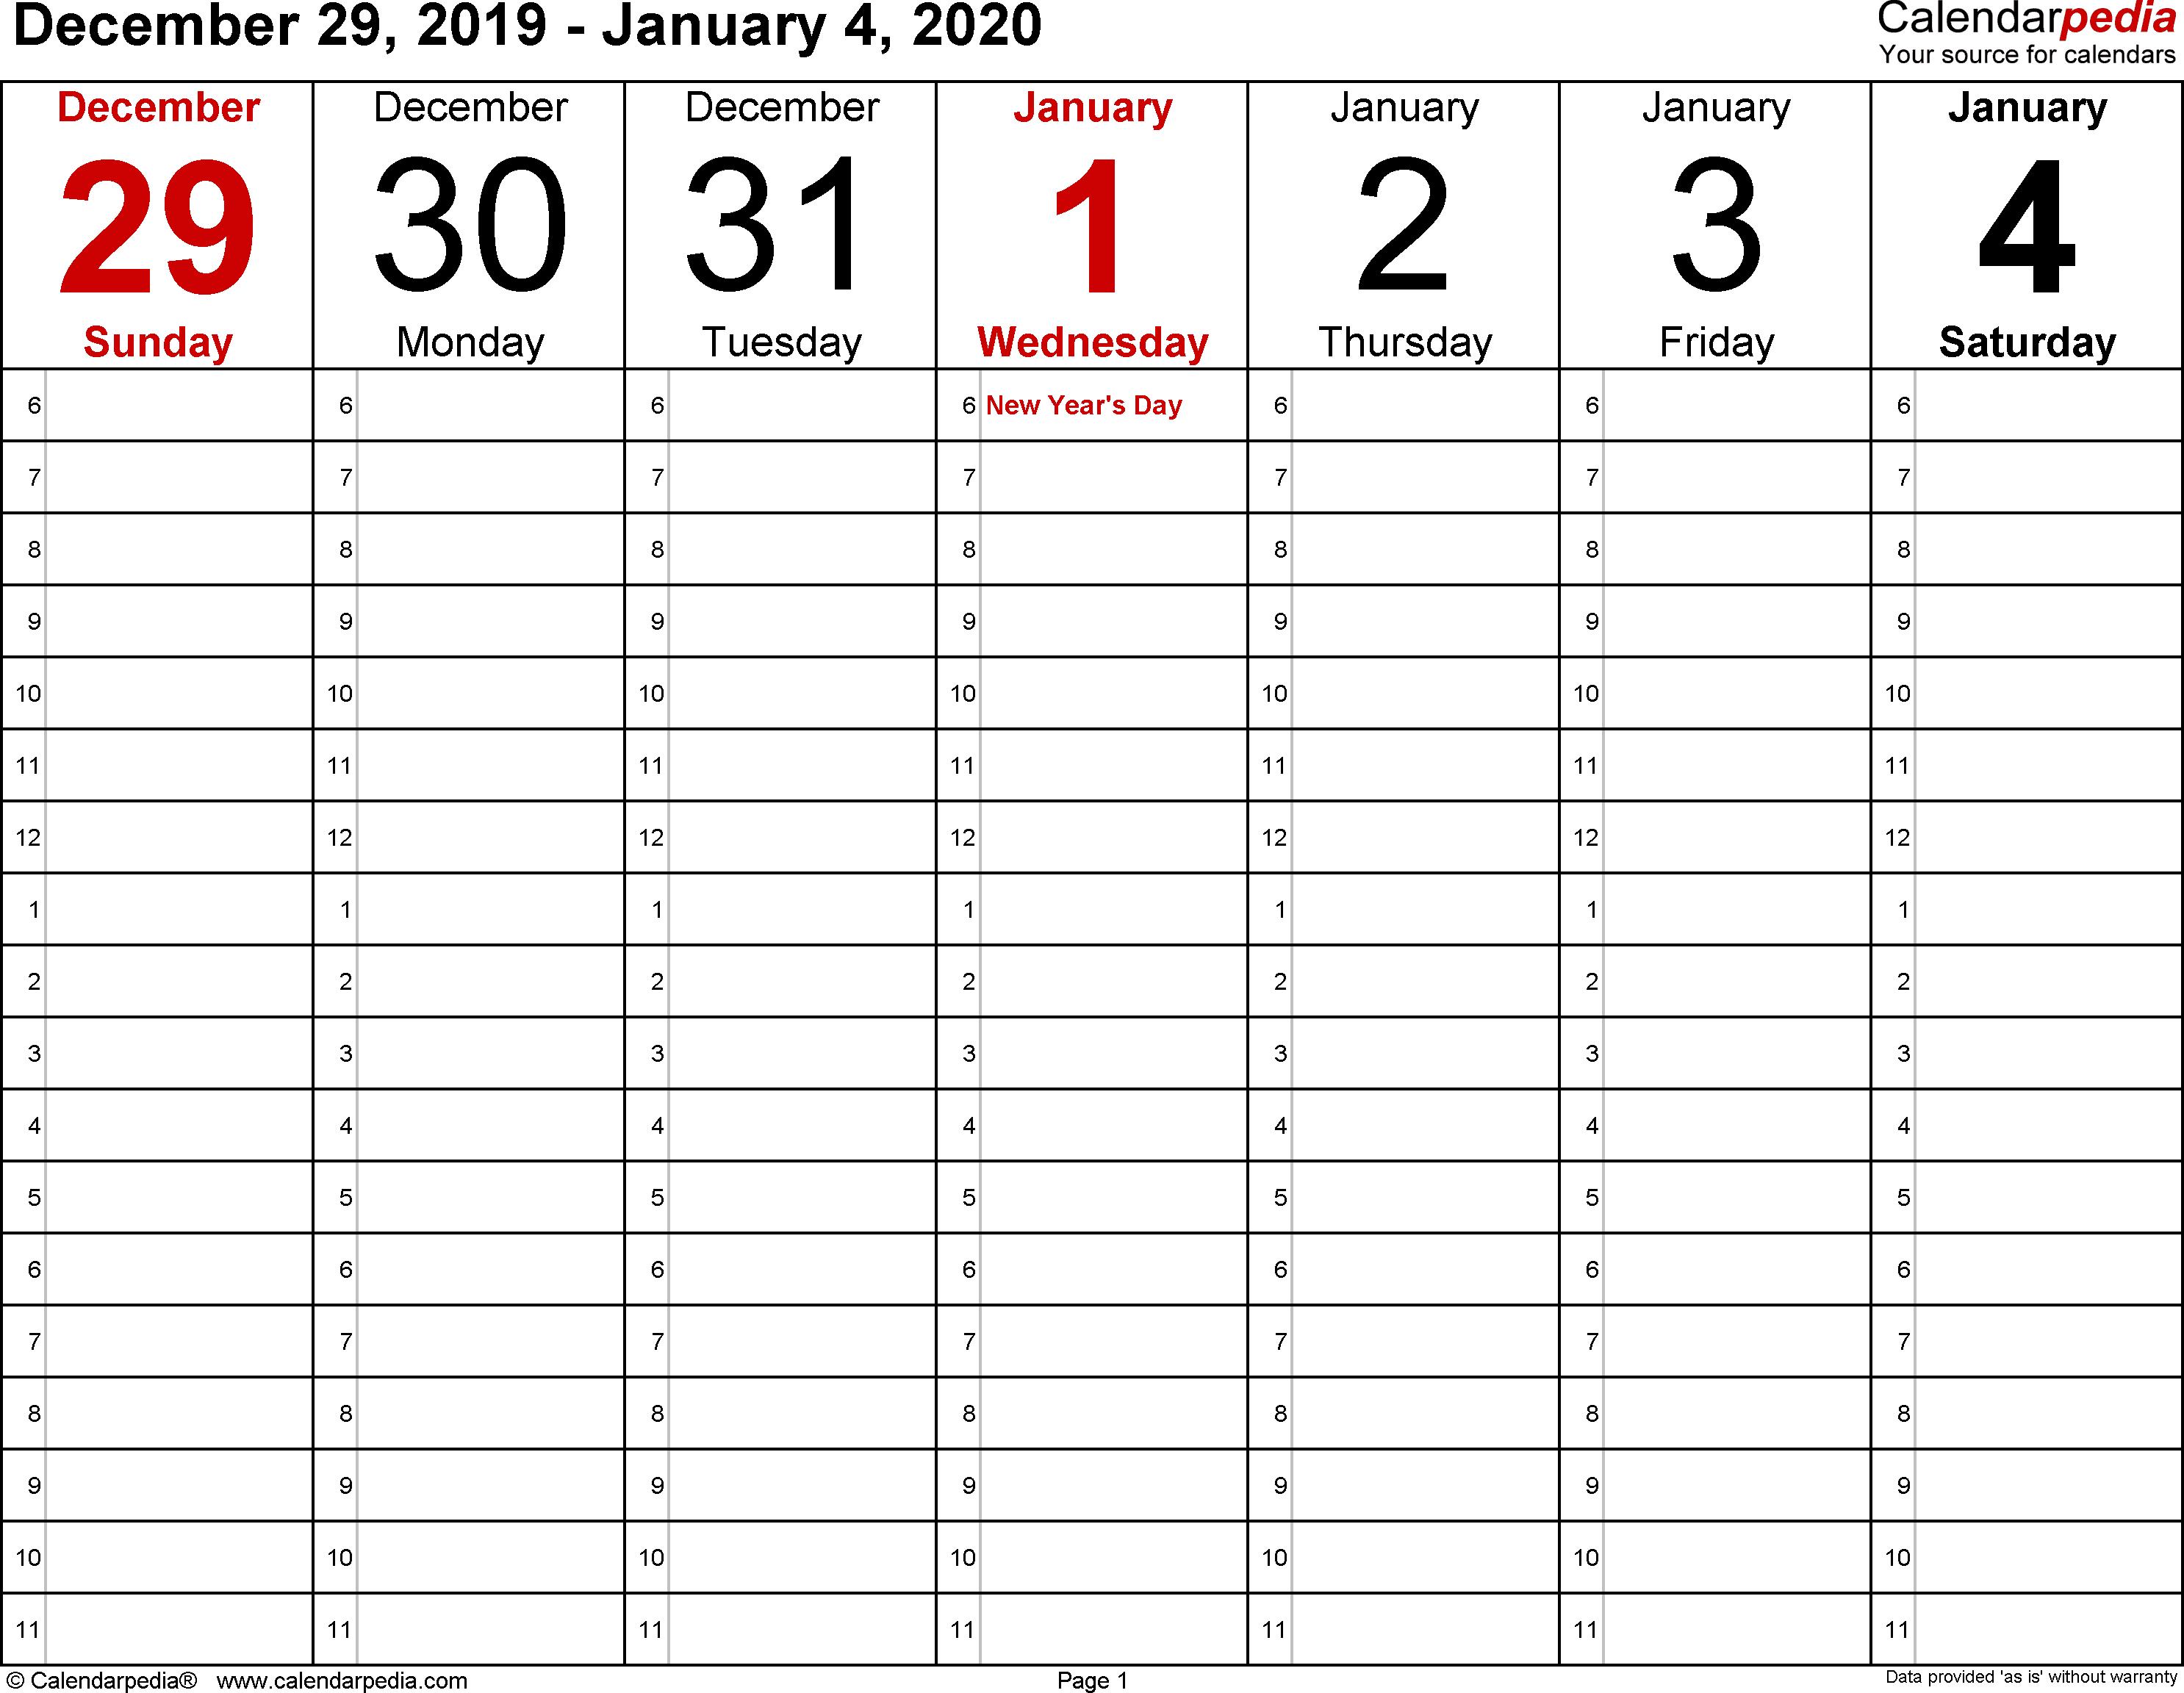 Weekly Calendars 2020 For Word - 12 Free Printable Templates regarding October 2020 Printable Planning Calendar In Portrait